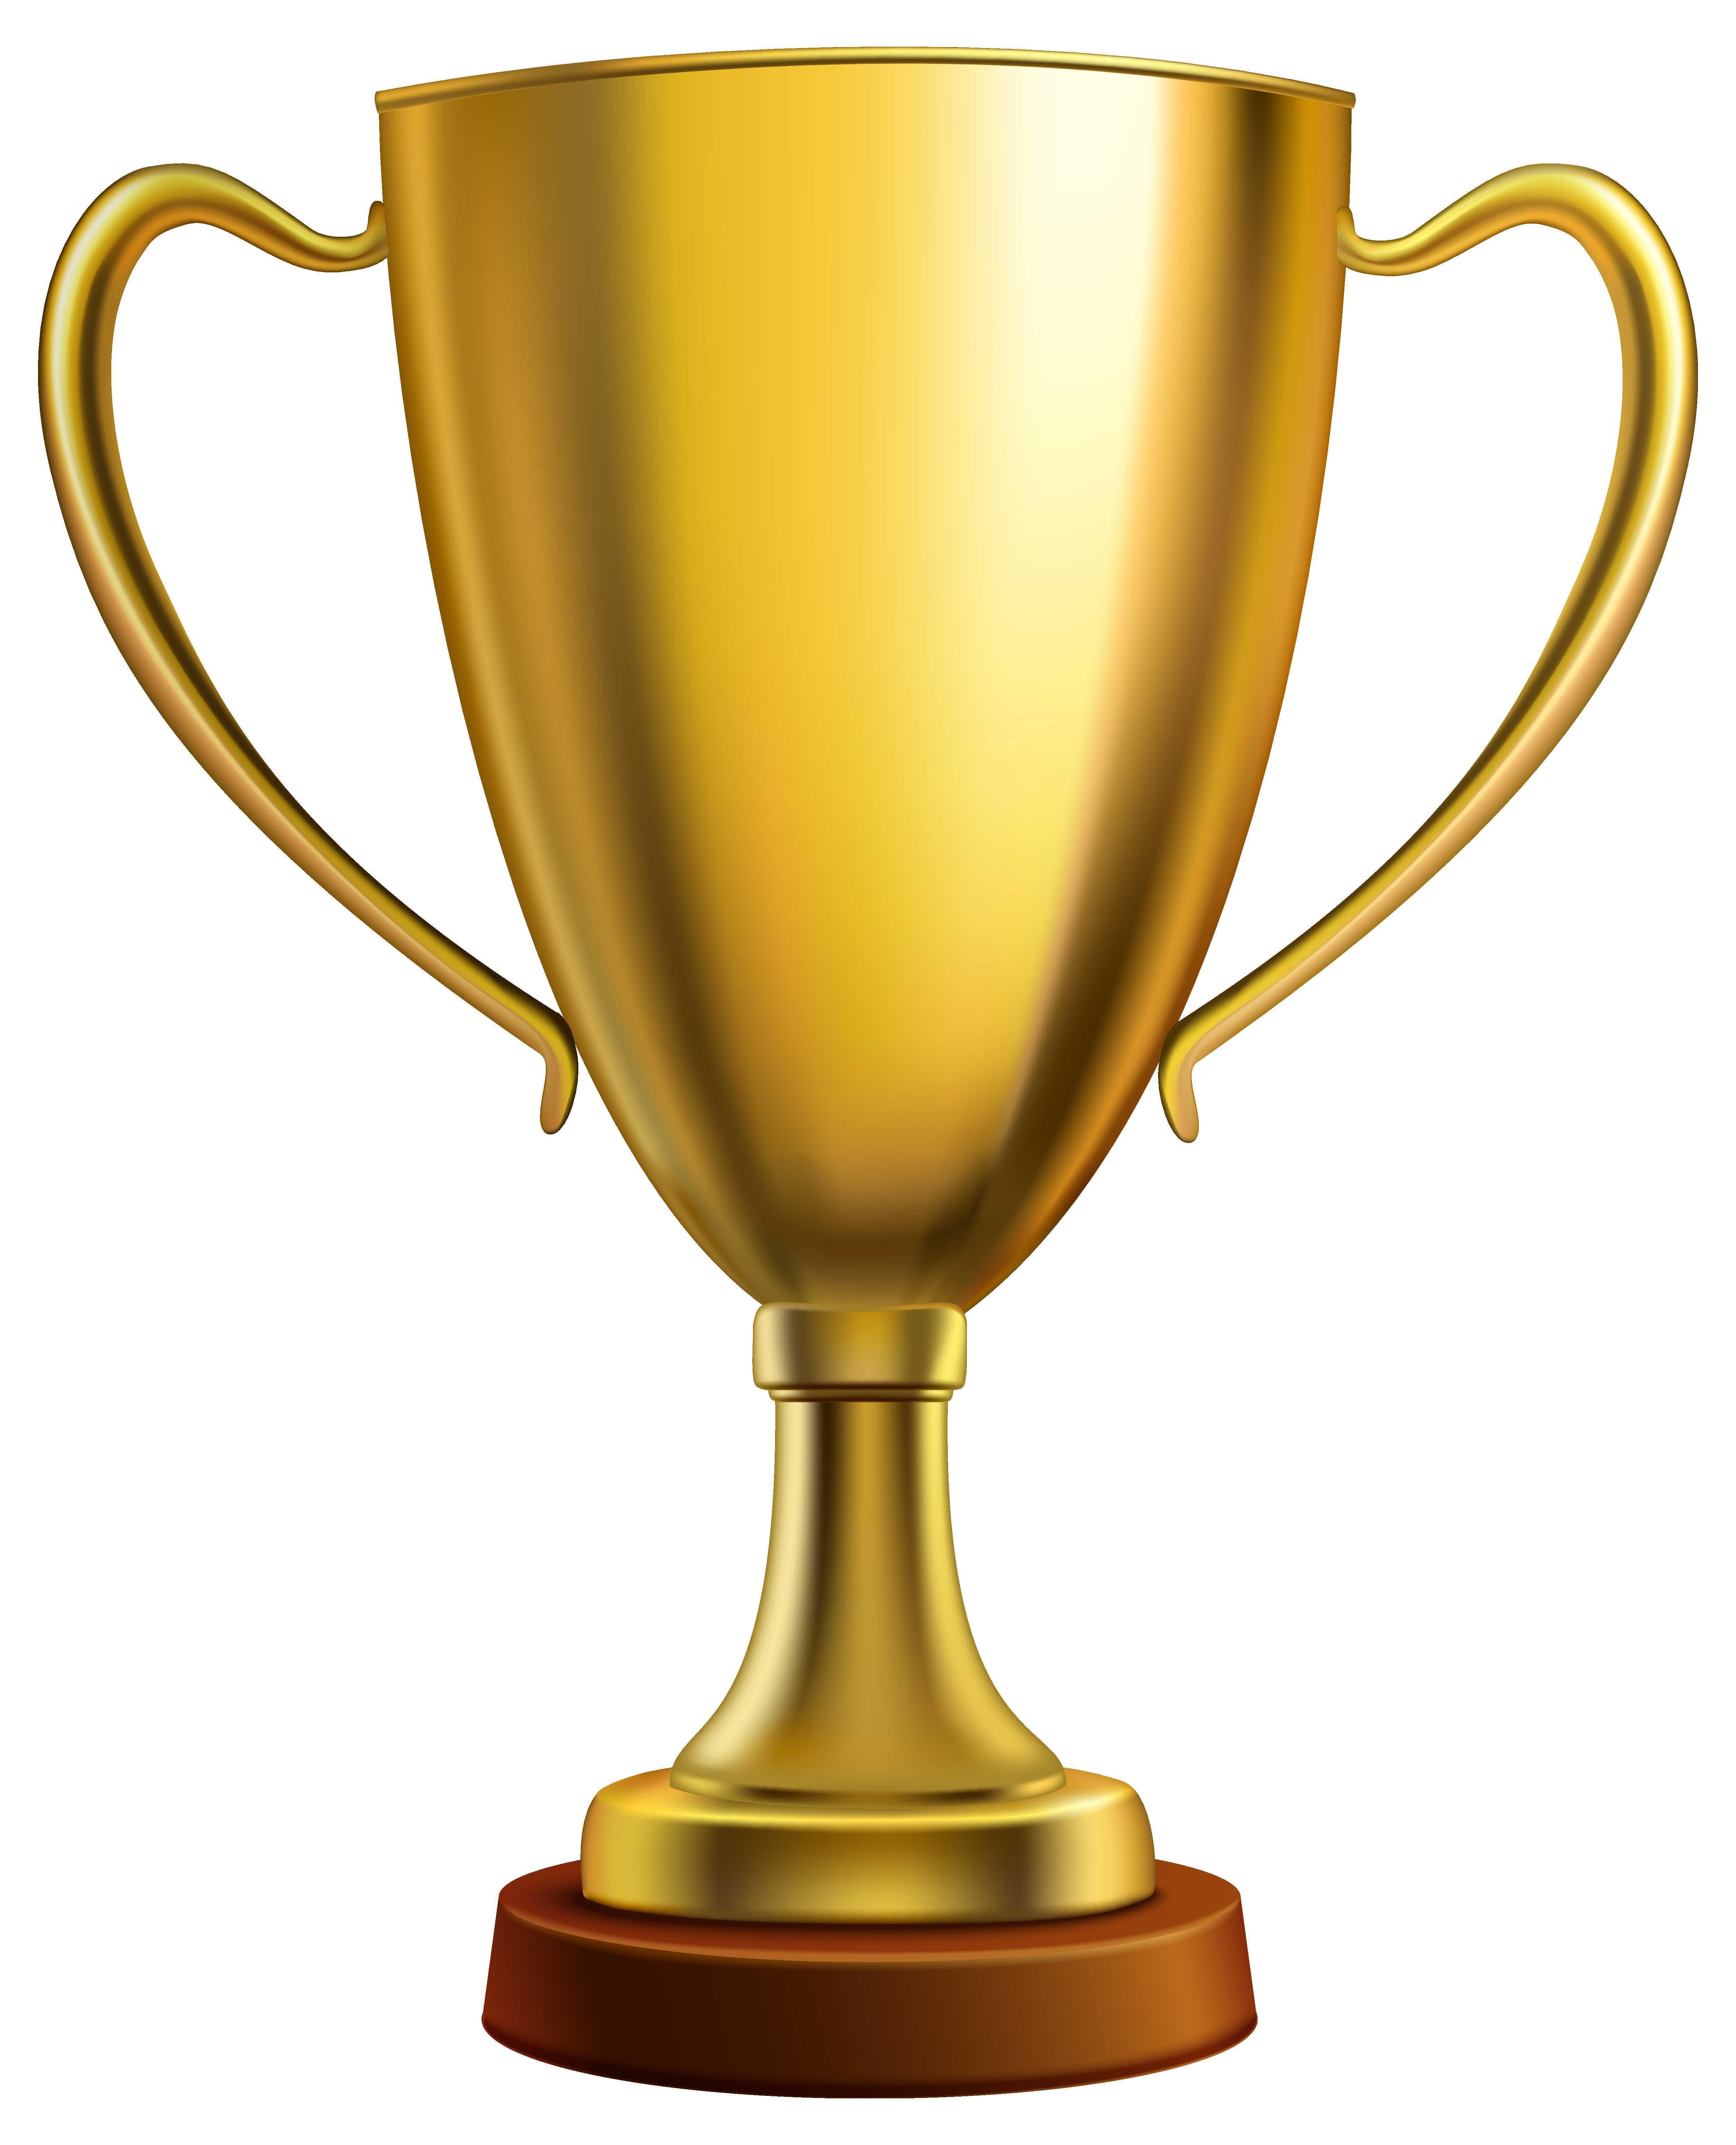 5022x6206 Beautiful Super Bowl Trophy Clipart